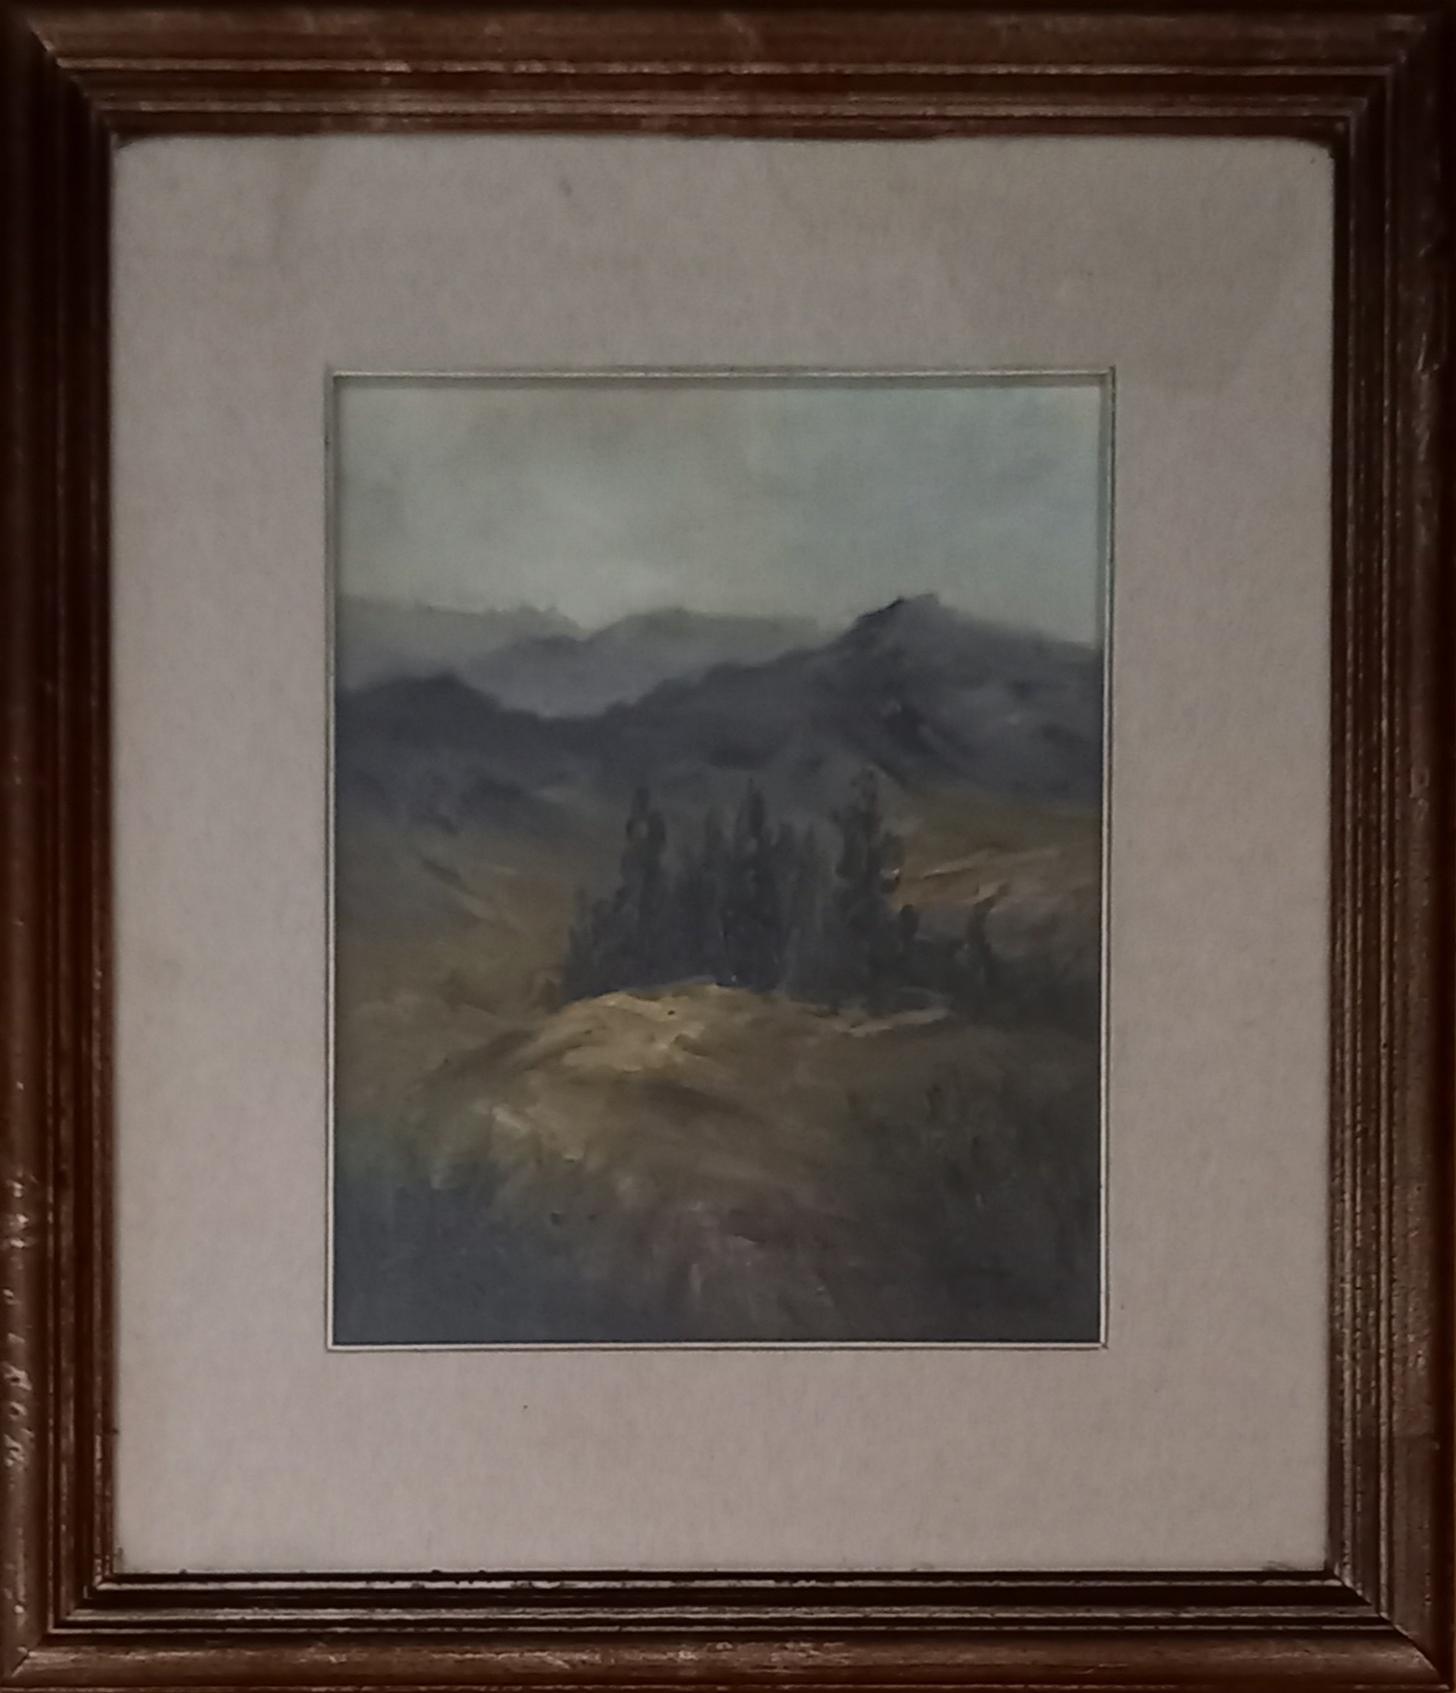 Alfredo Tesini – Pieve del pino